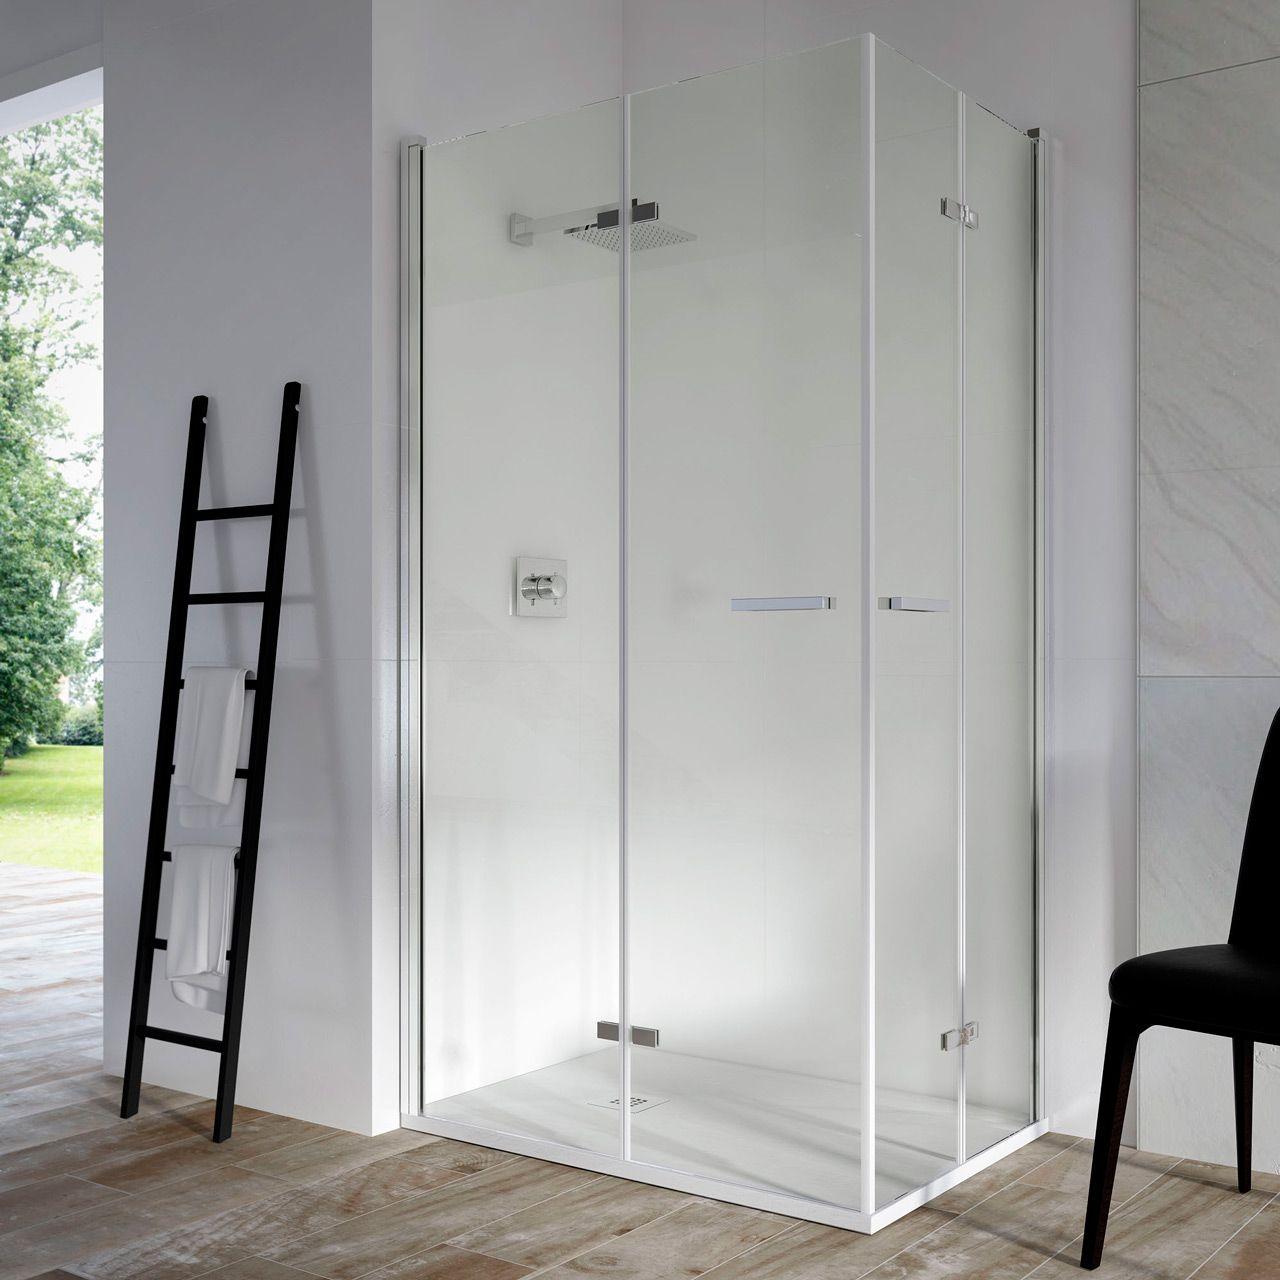 Mampara de ducha plegable modelo Aqua: 2 puertas plegables. #mampara ...